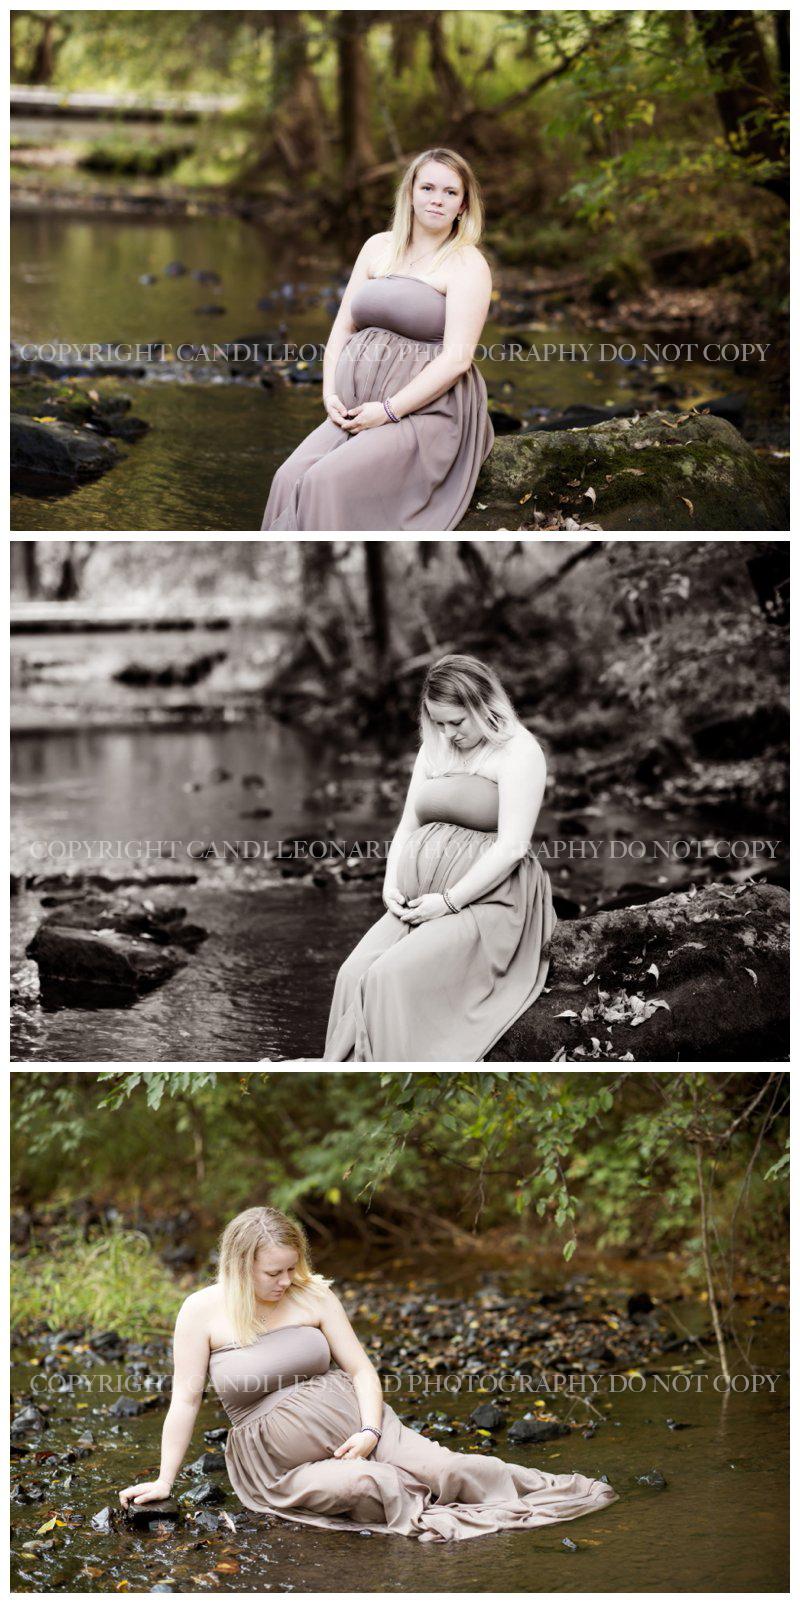 Creek_maternity_asheboro_NC__0234